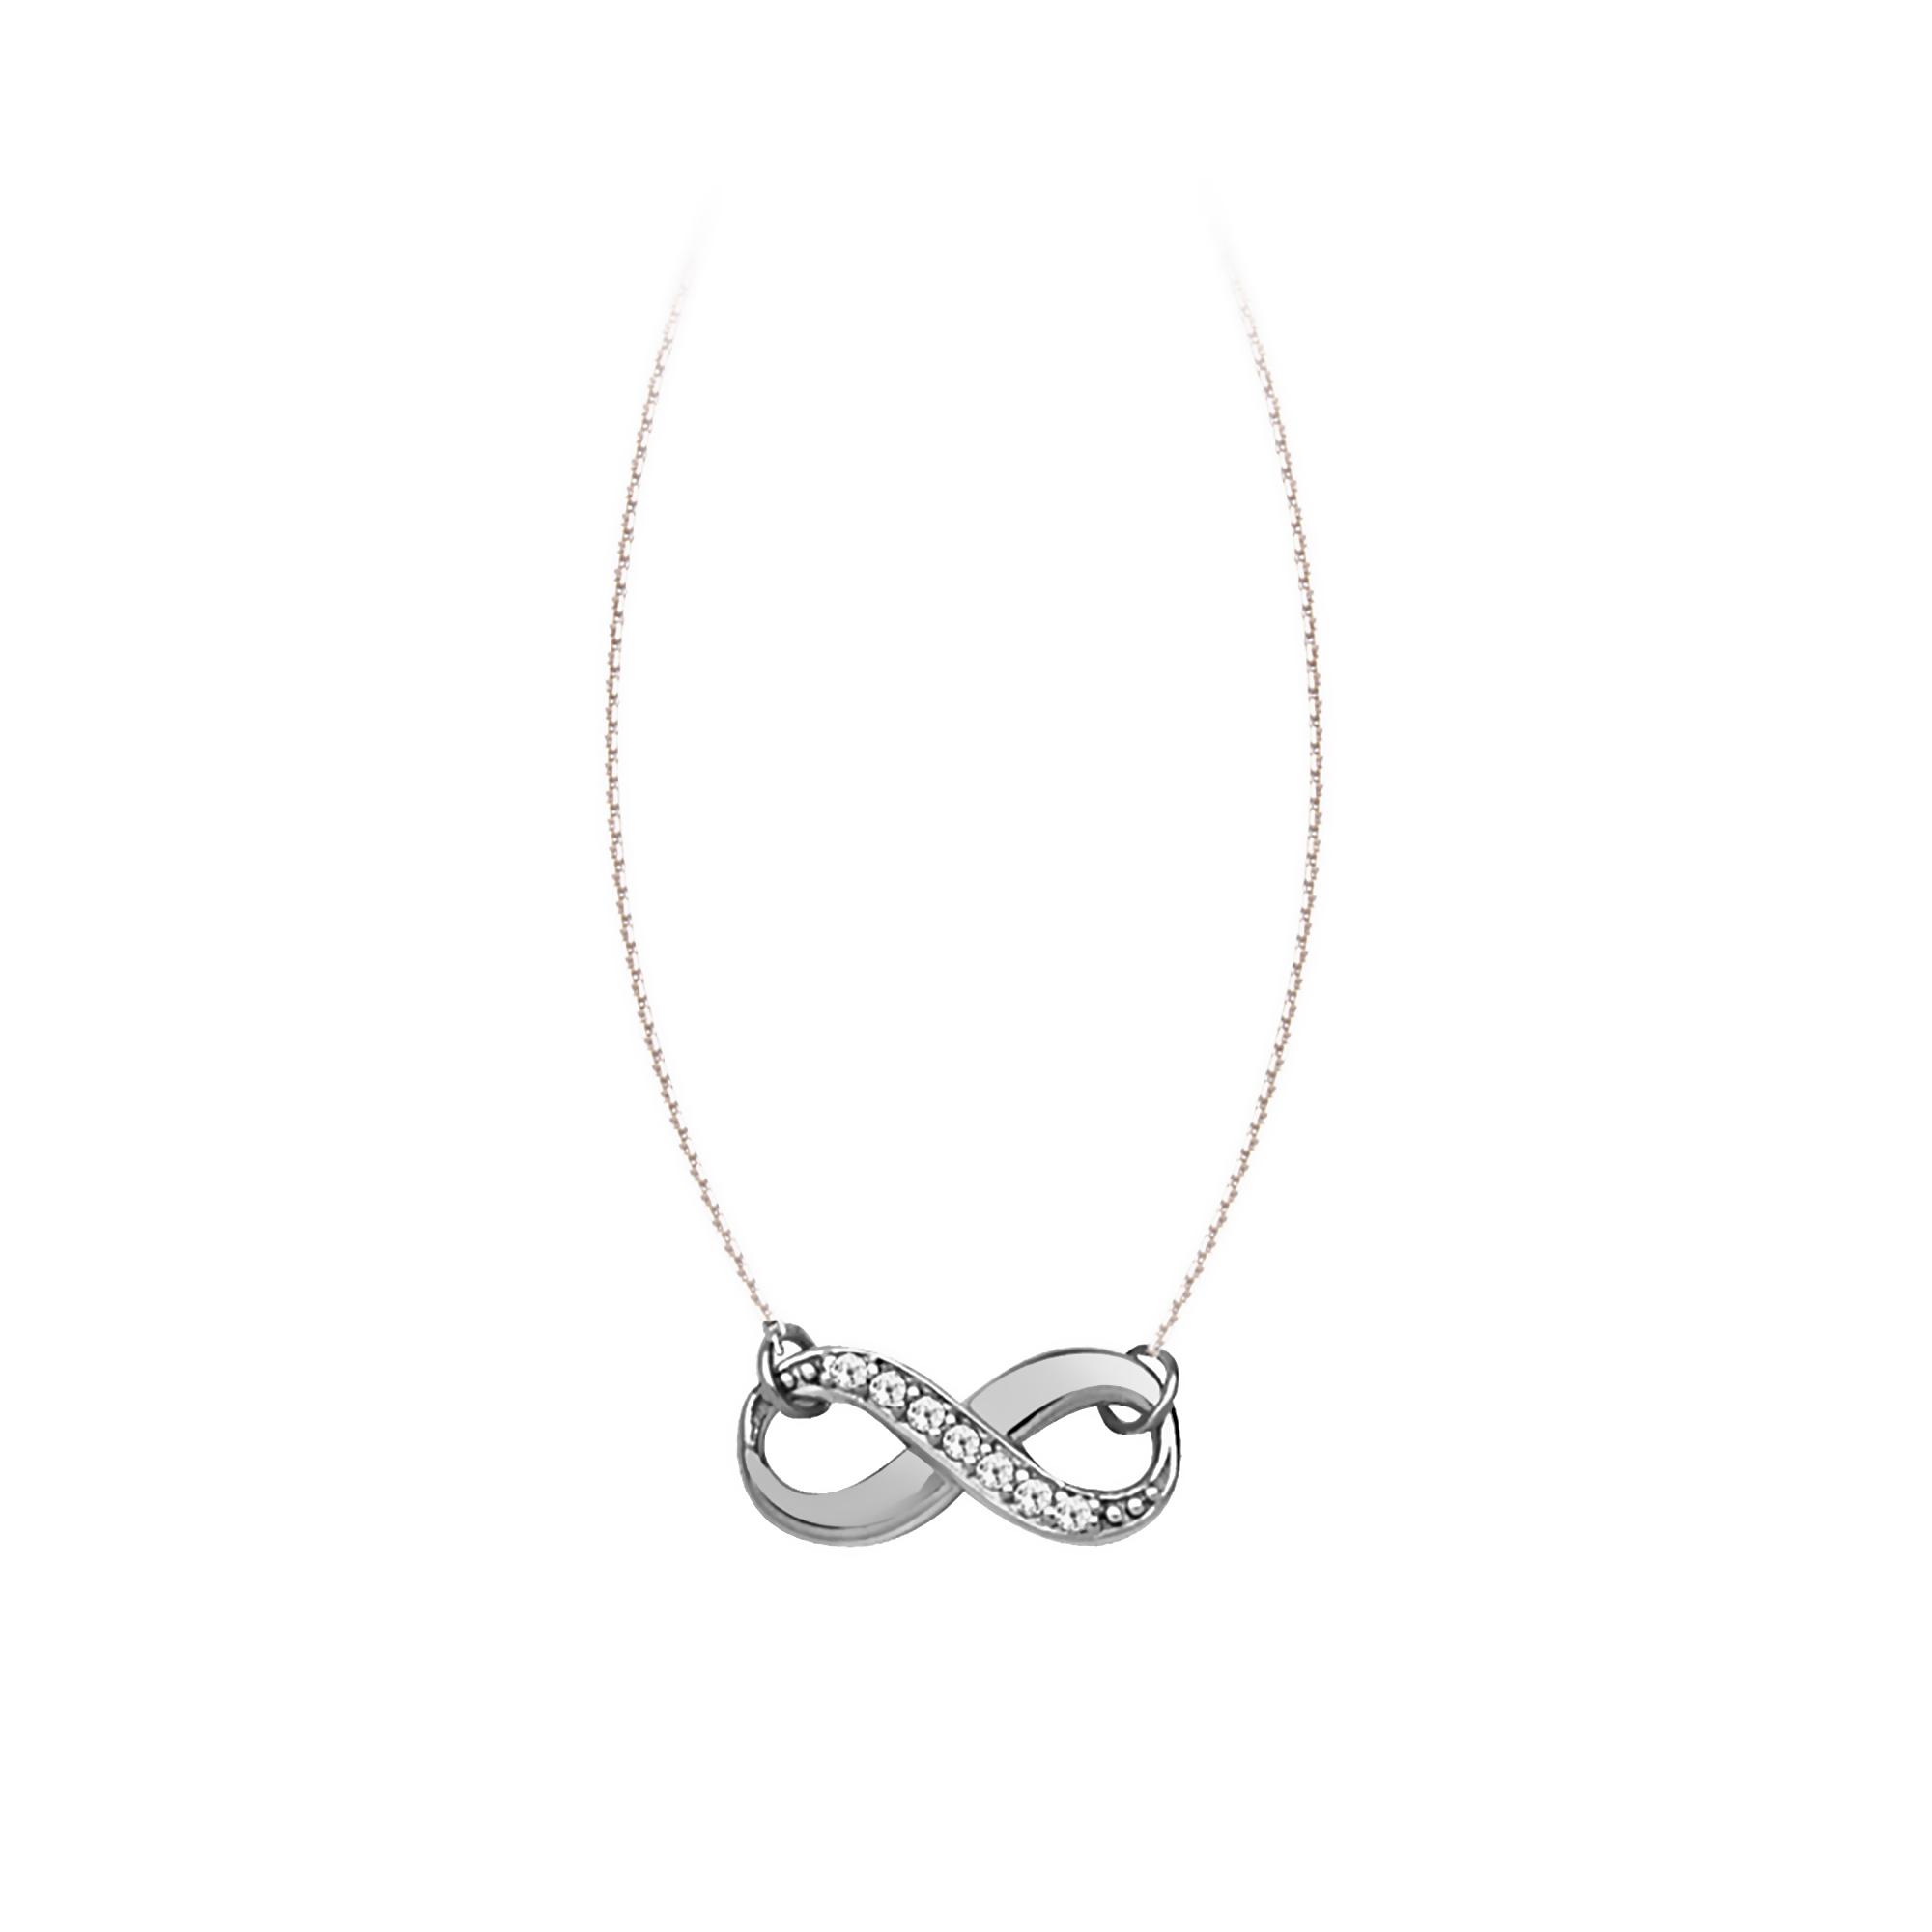 Infinity Necklace, 14Kt Gold & Diamond Infinity Necklace 18